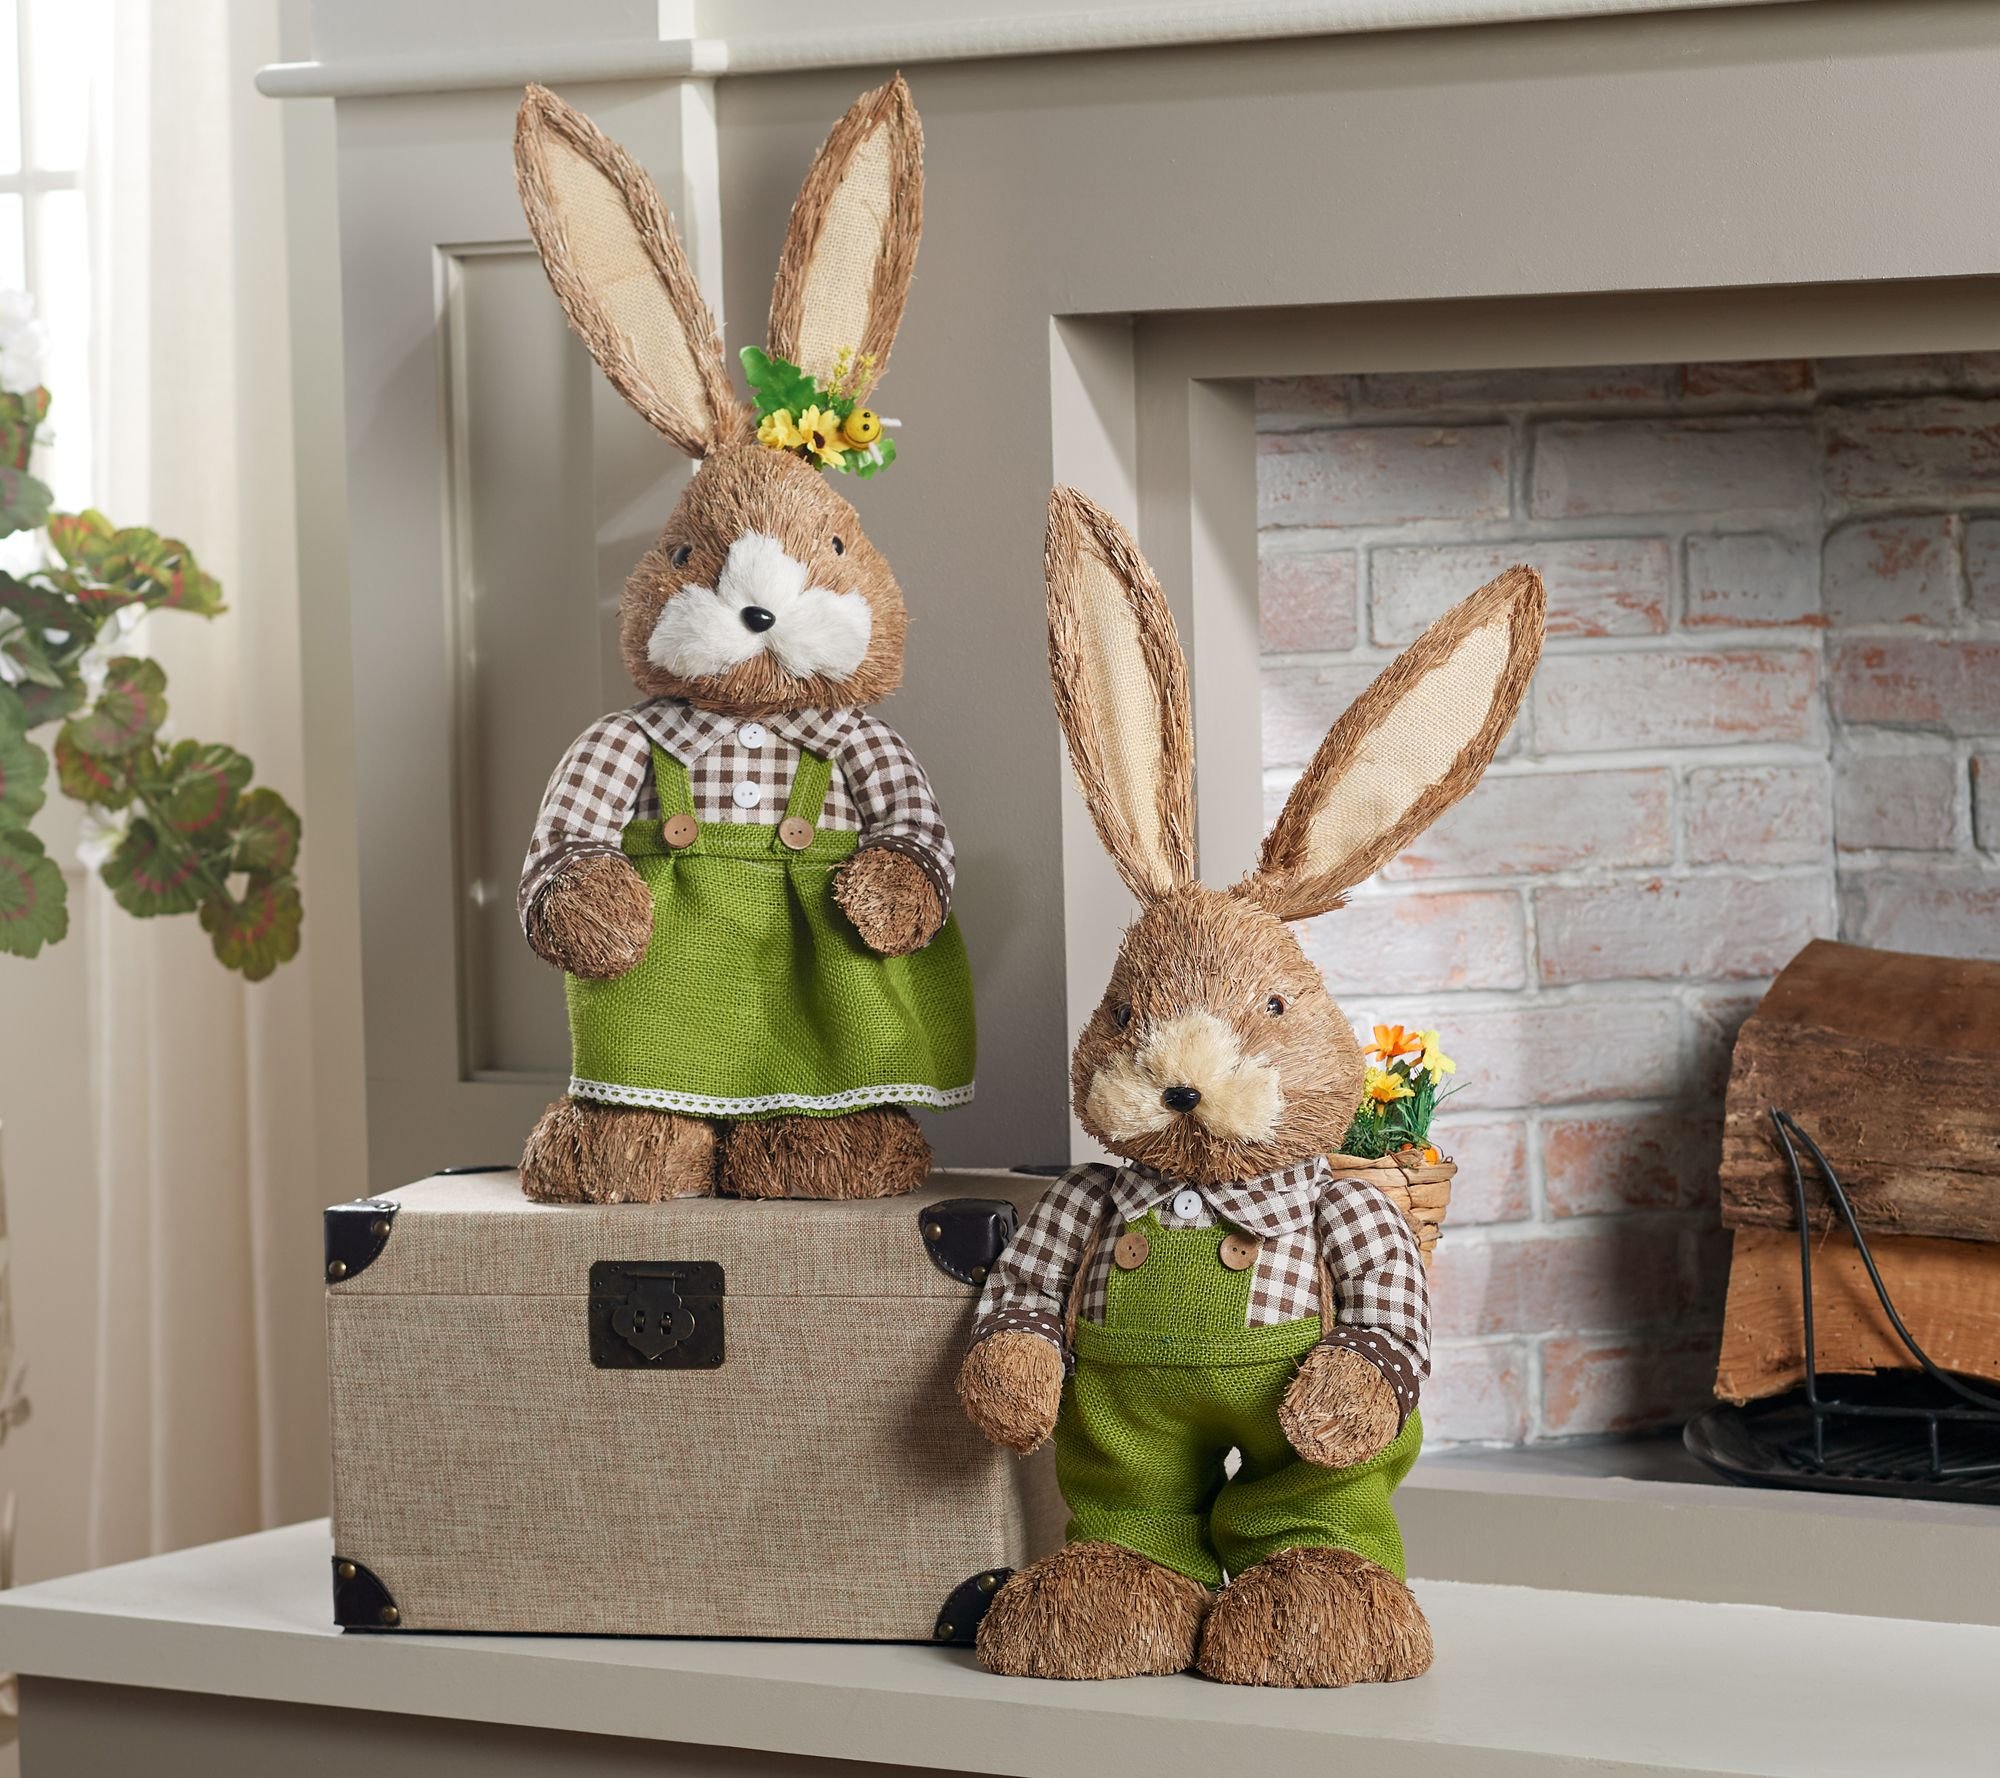 Bunny Rabbits Cute Fun Animal Women Teen Girls Casual Ankle Socks Easter Gifts